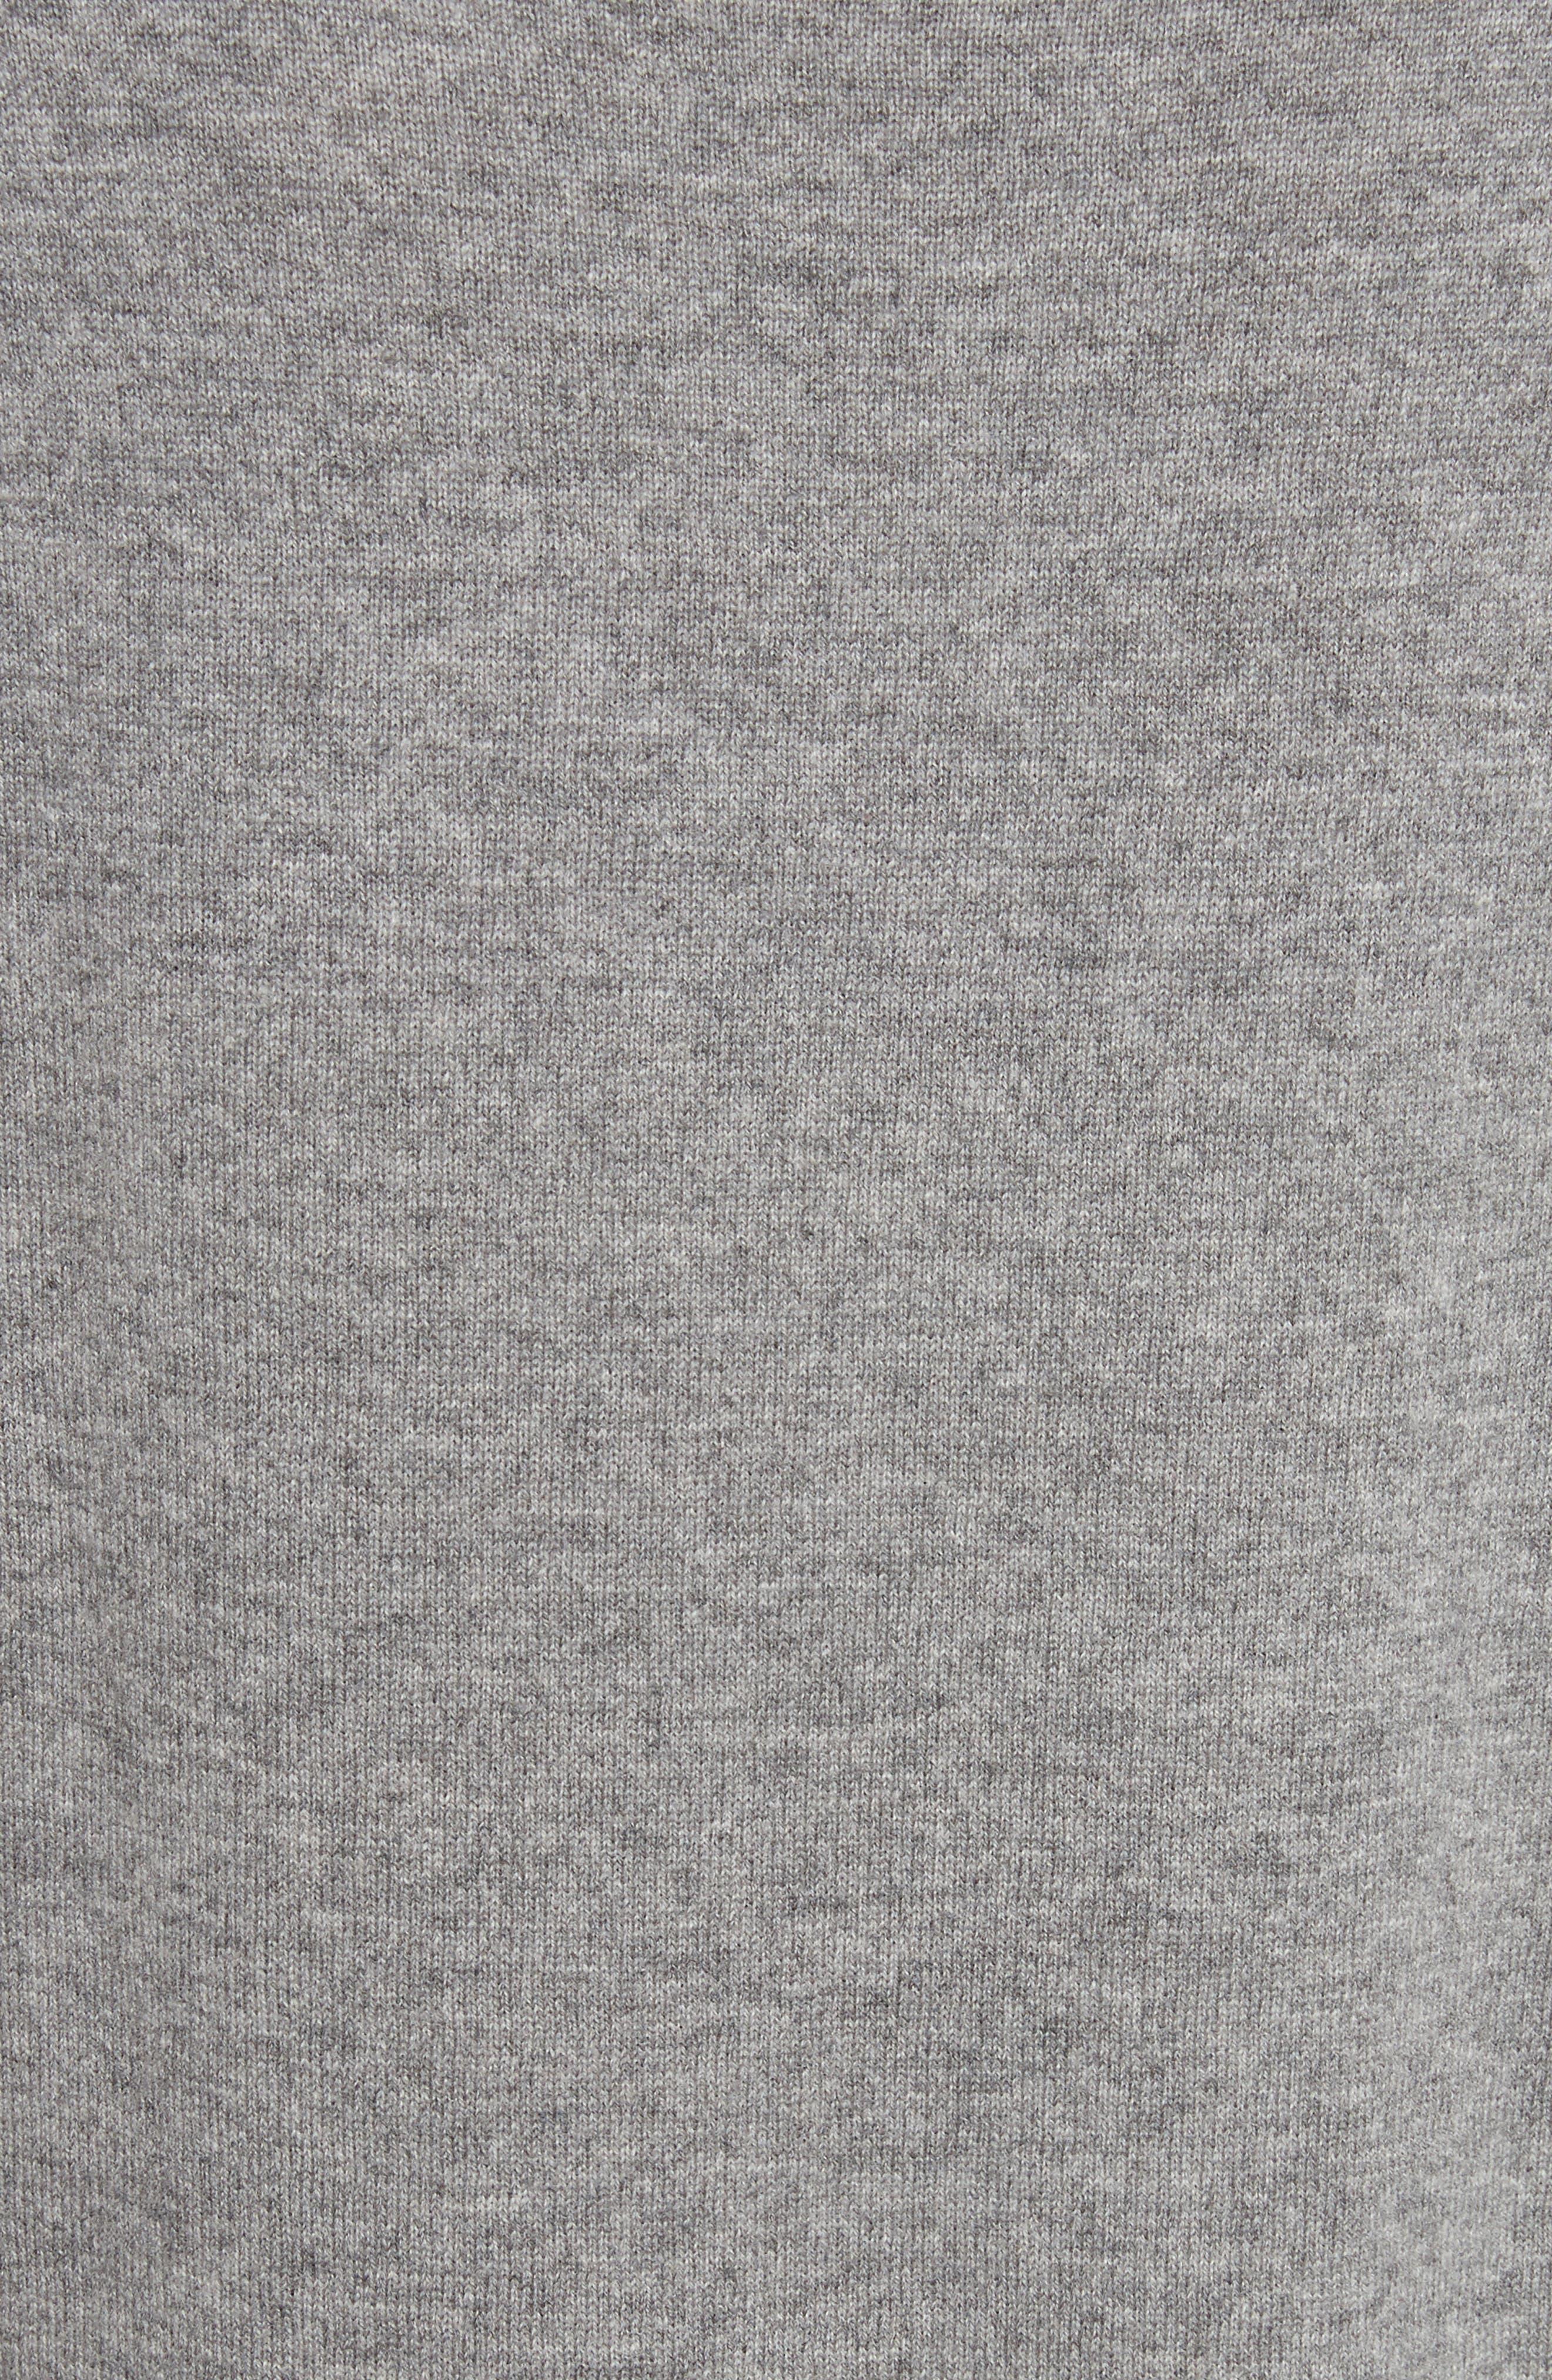 Cashmere Drop Waist Sweater Dress,                             Alternate thumbnail 5, color,                             027